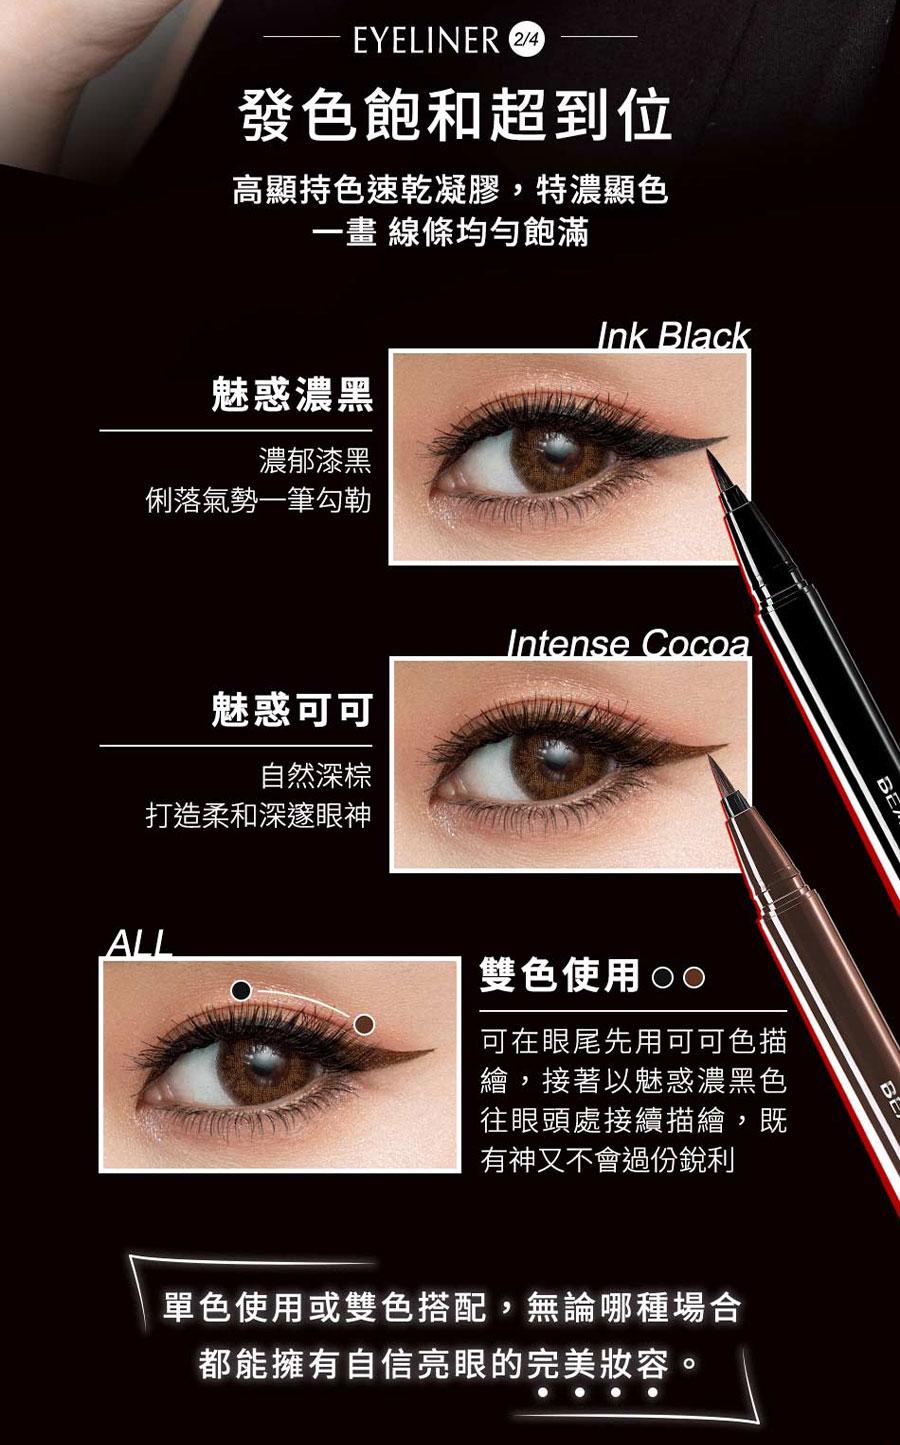 Smudge-Proof Liquid Eyeliner - Type